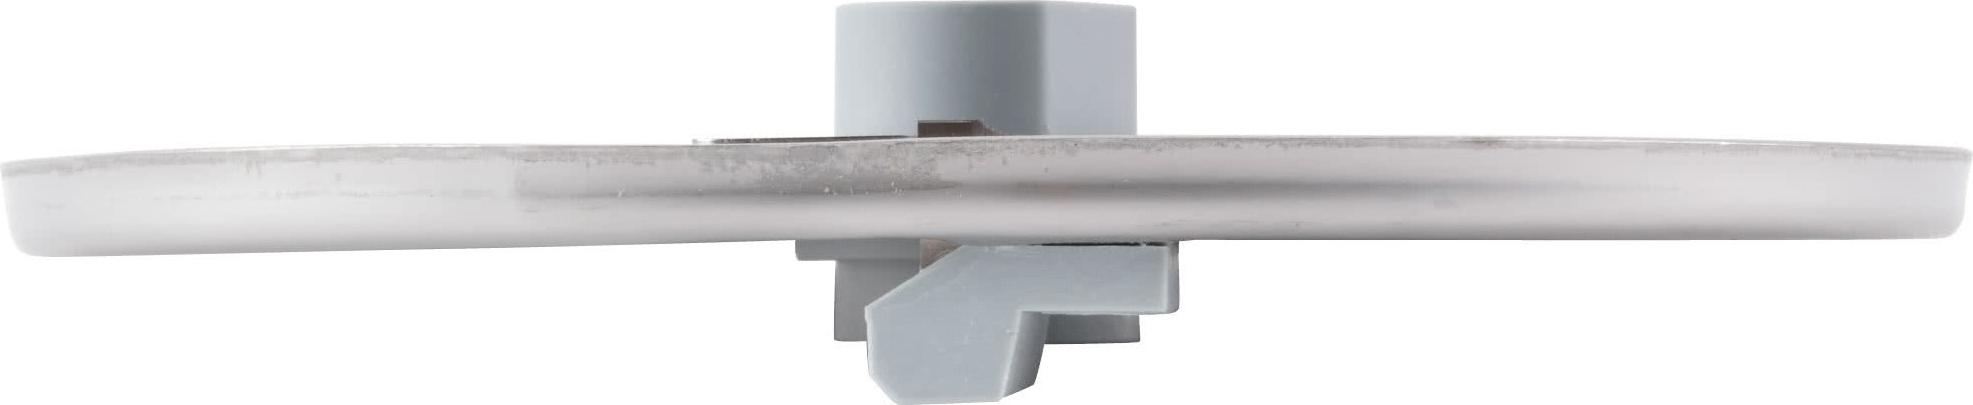 Диск-соломка Robot Coupe 27048 (8x8 мм) - 3